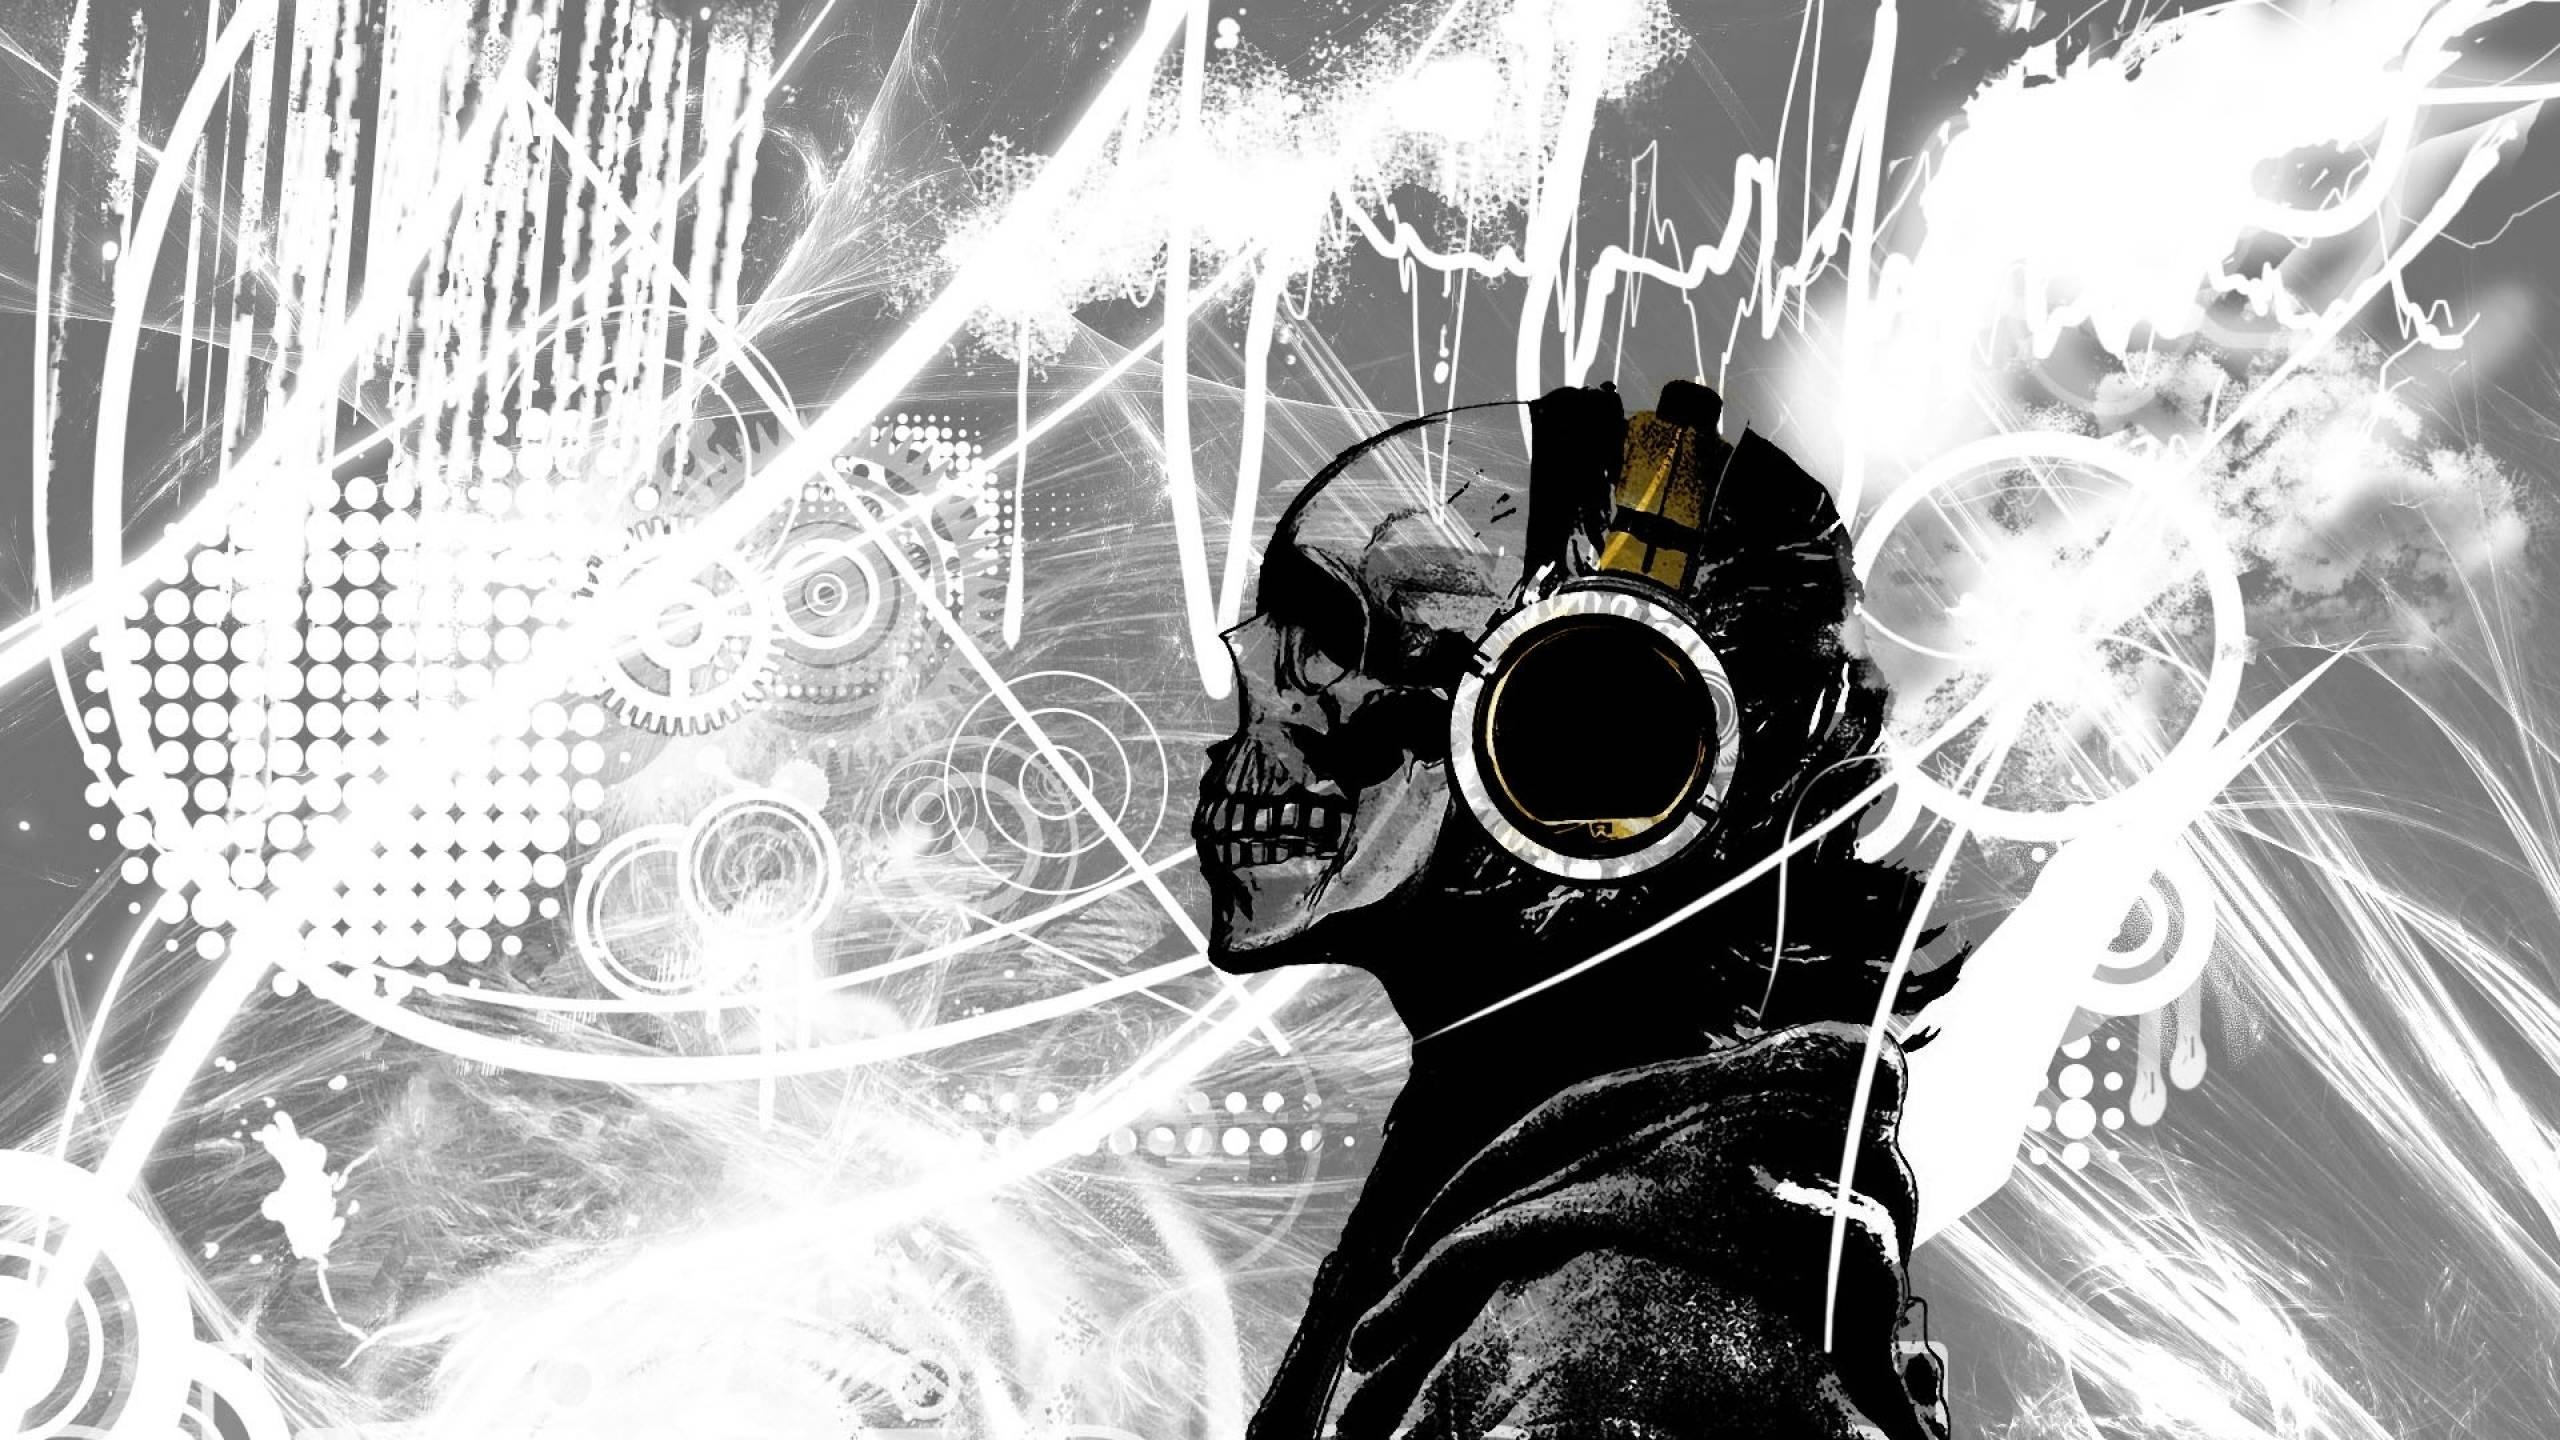 Cool Computer Backgrounds Skull 2560x1440 Wallpaper Teahub Io